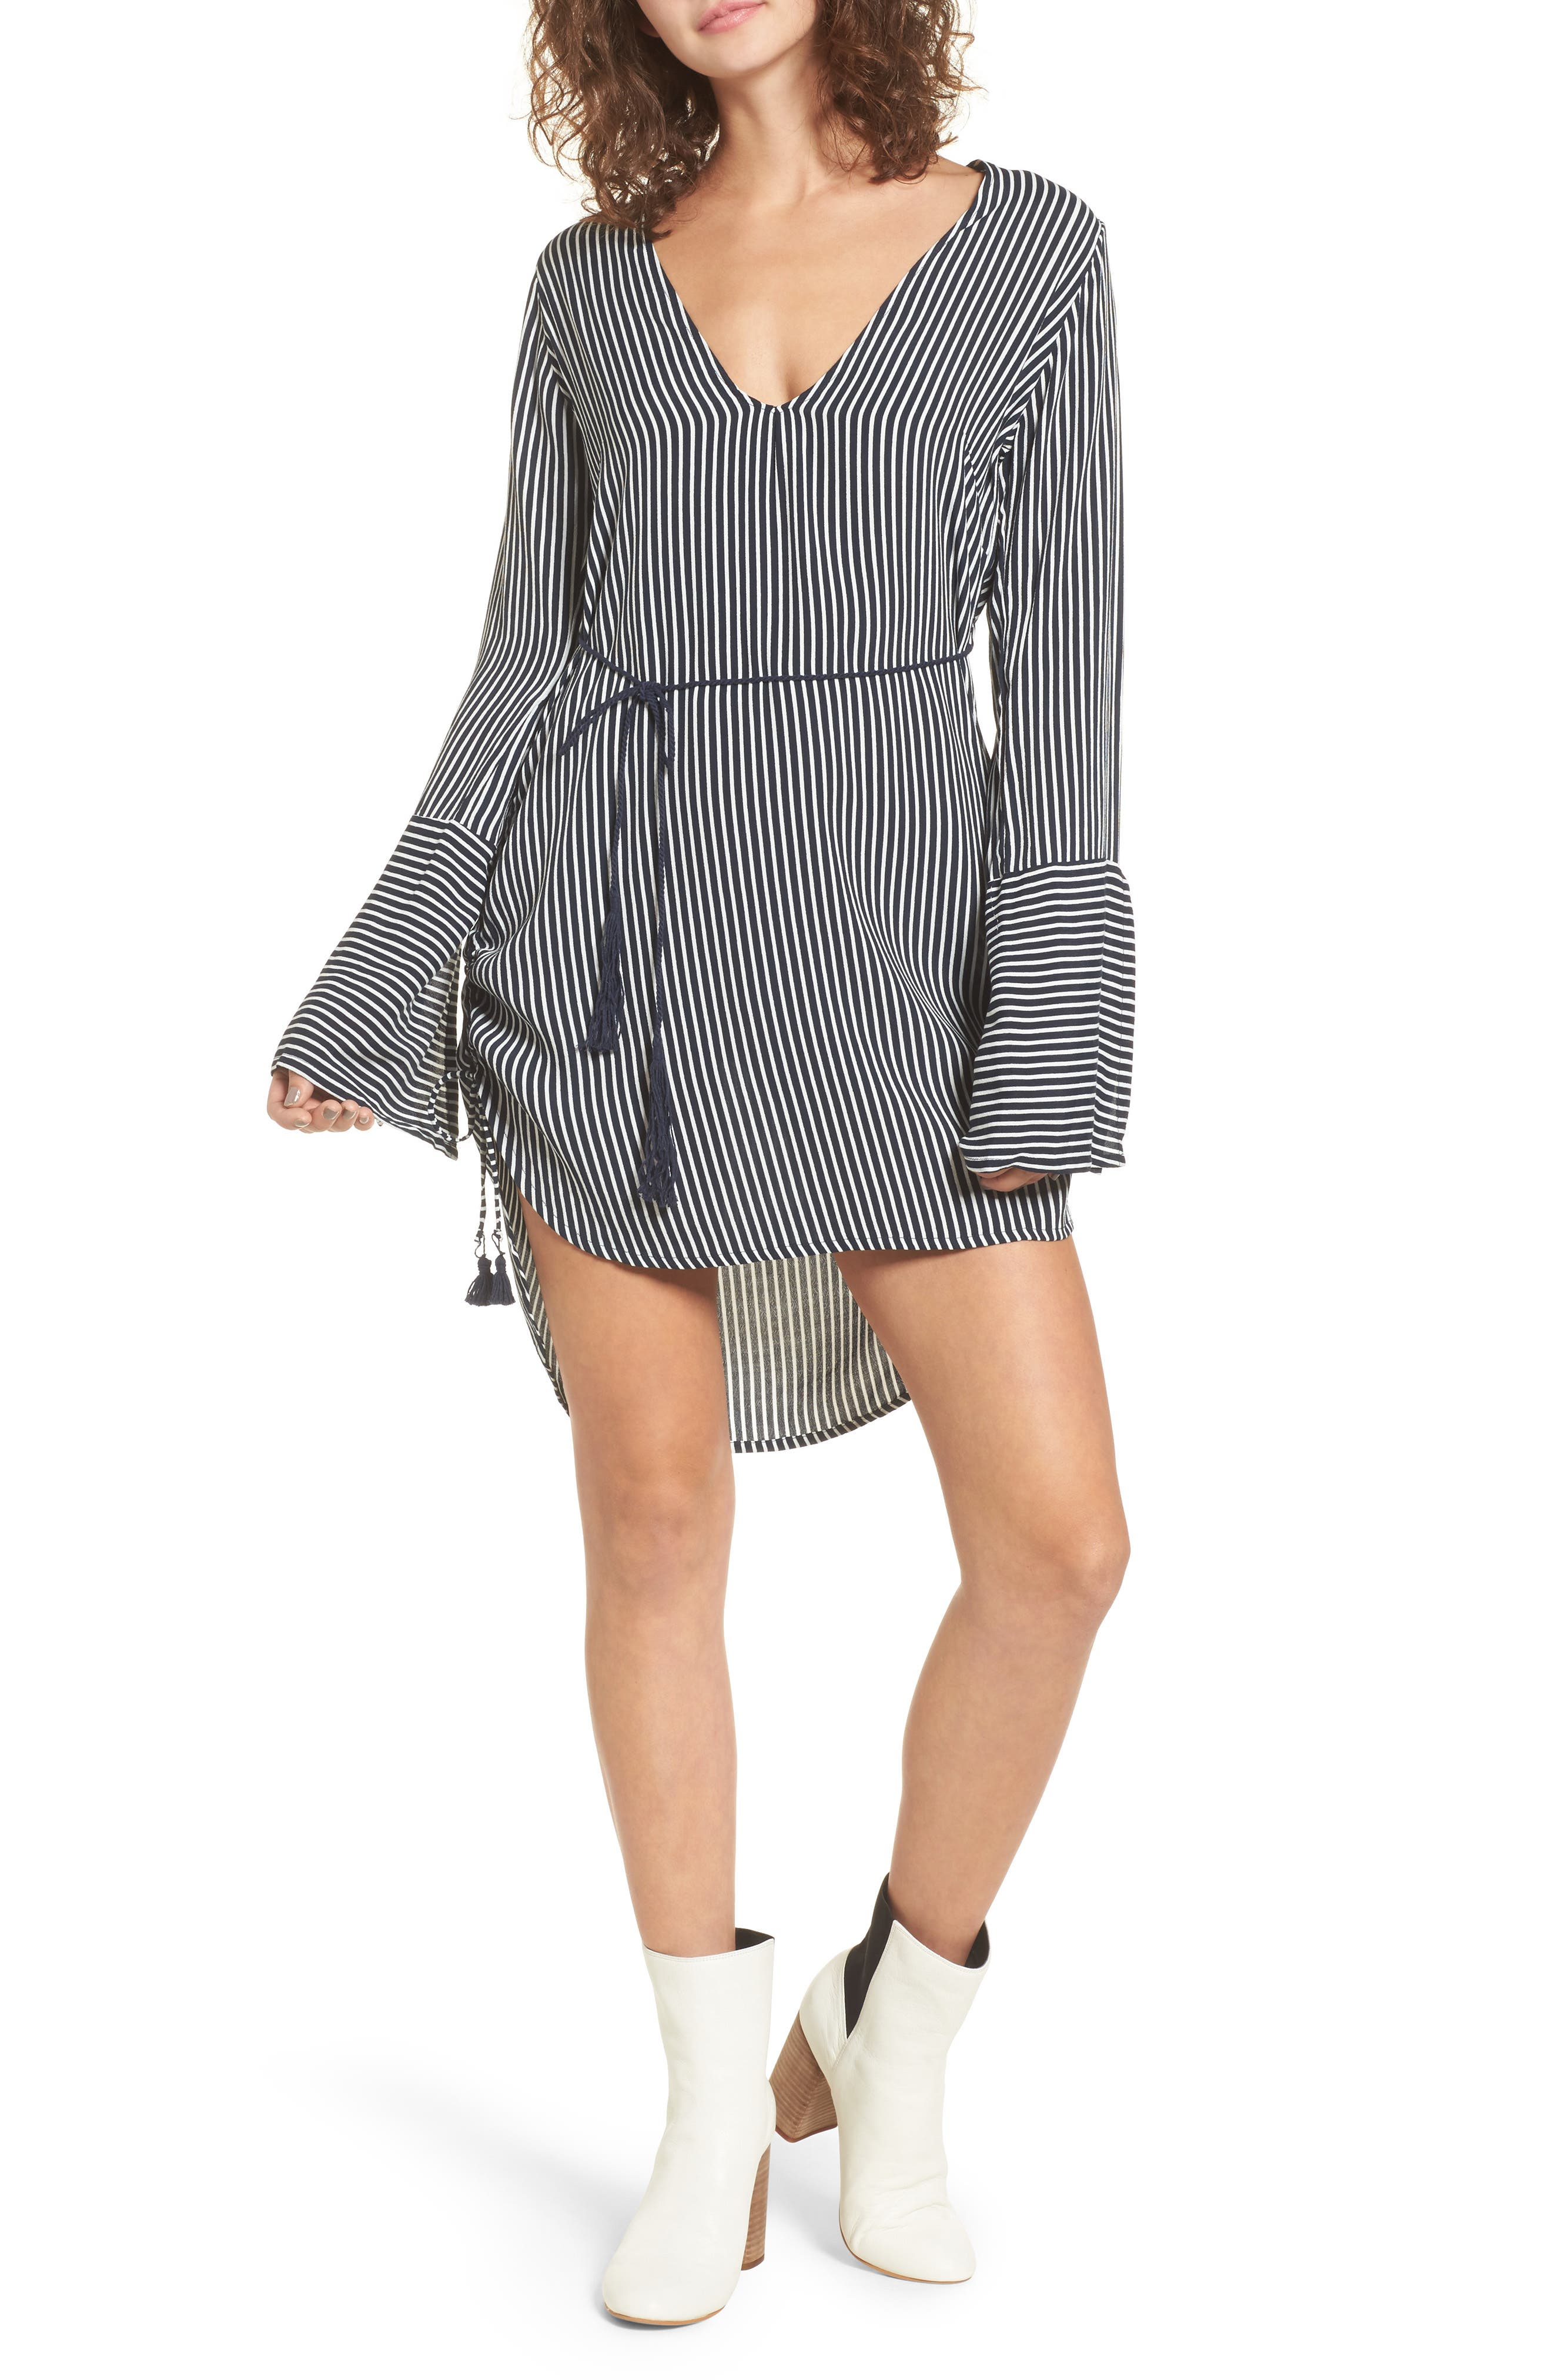 Neroli Stripe Dress,                         Main,                         color, Cap Maison Stripe Print